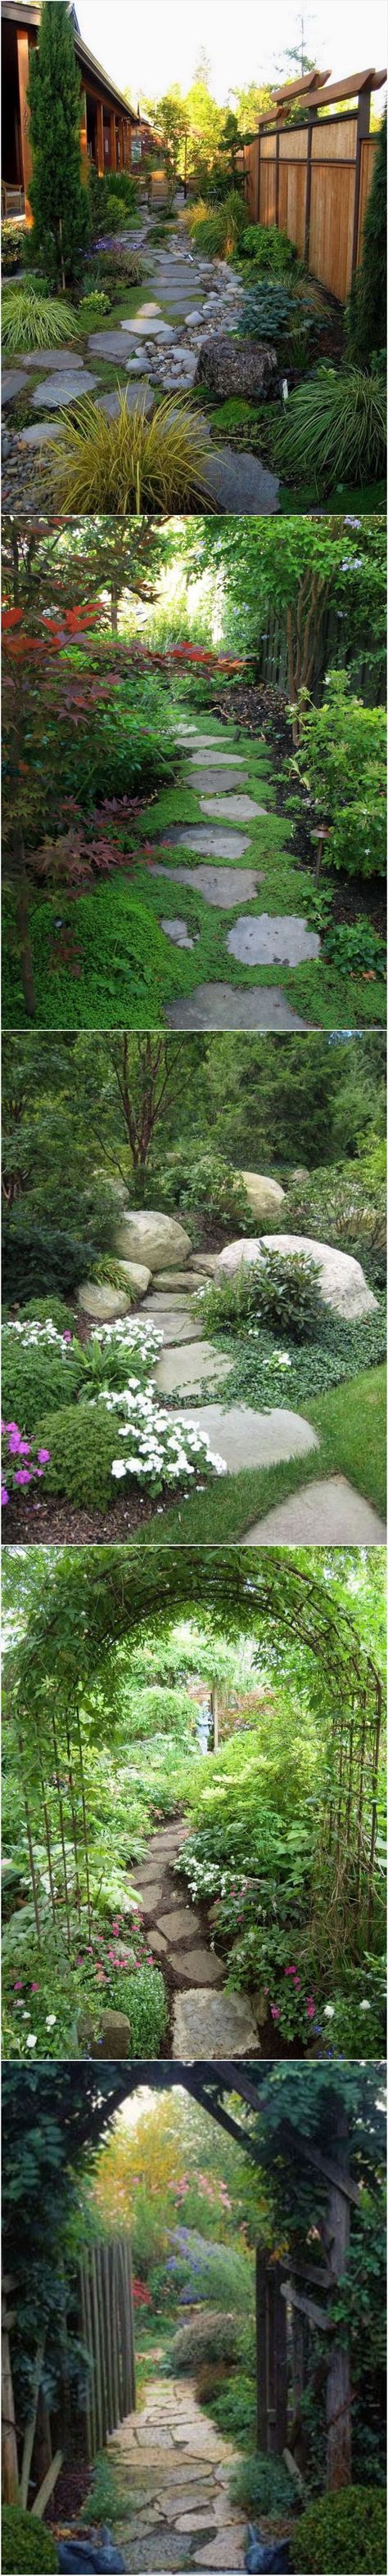 24 best backyard woods images on pinterest landscaping backyard